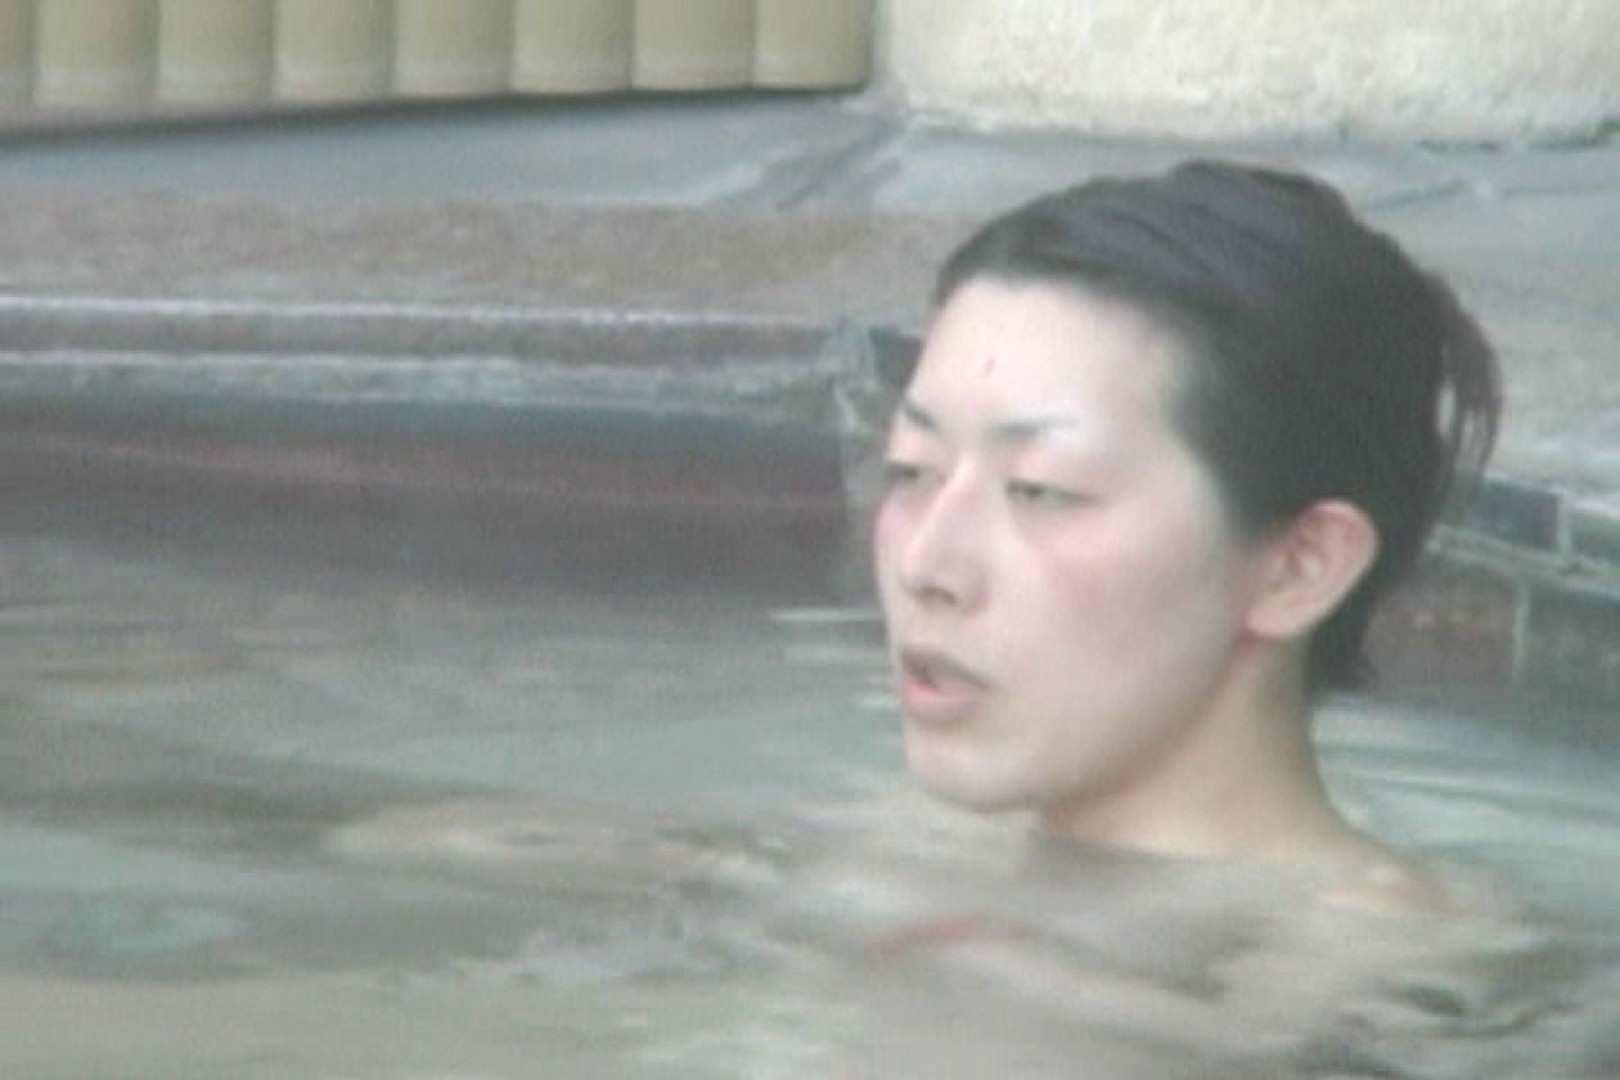 Aquaな露天風呂Vol.589 盗撮 | HなOL  105pic 6